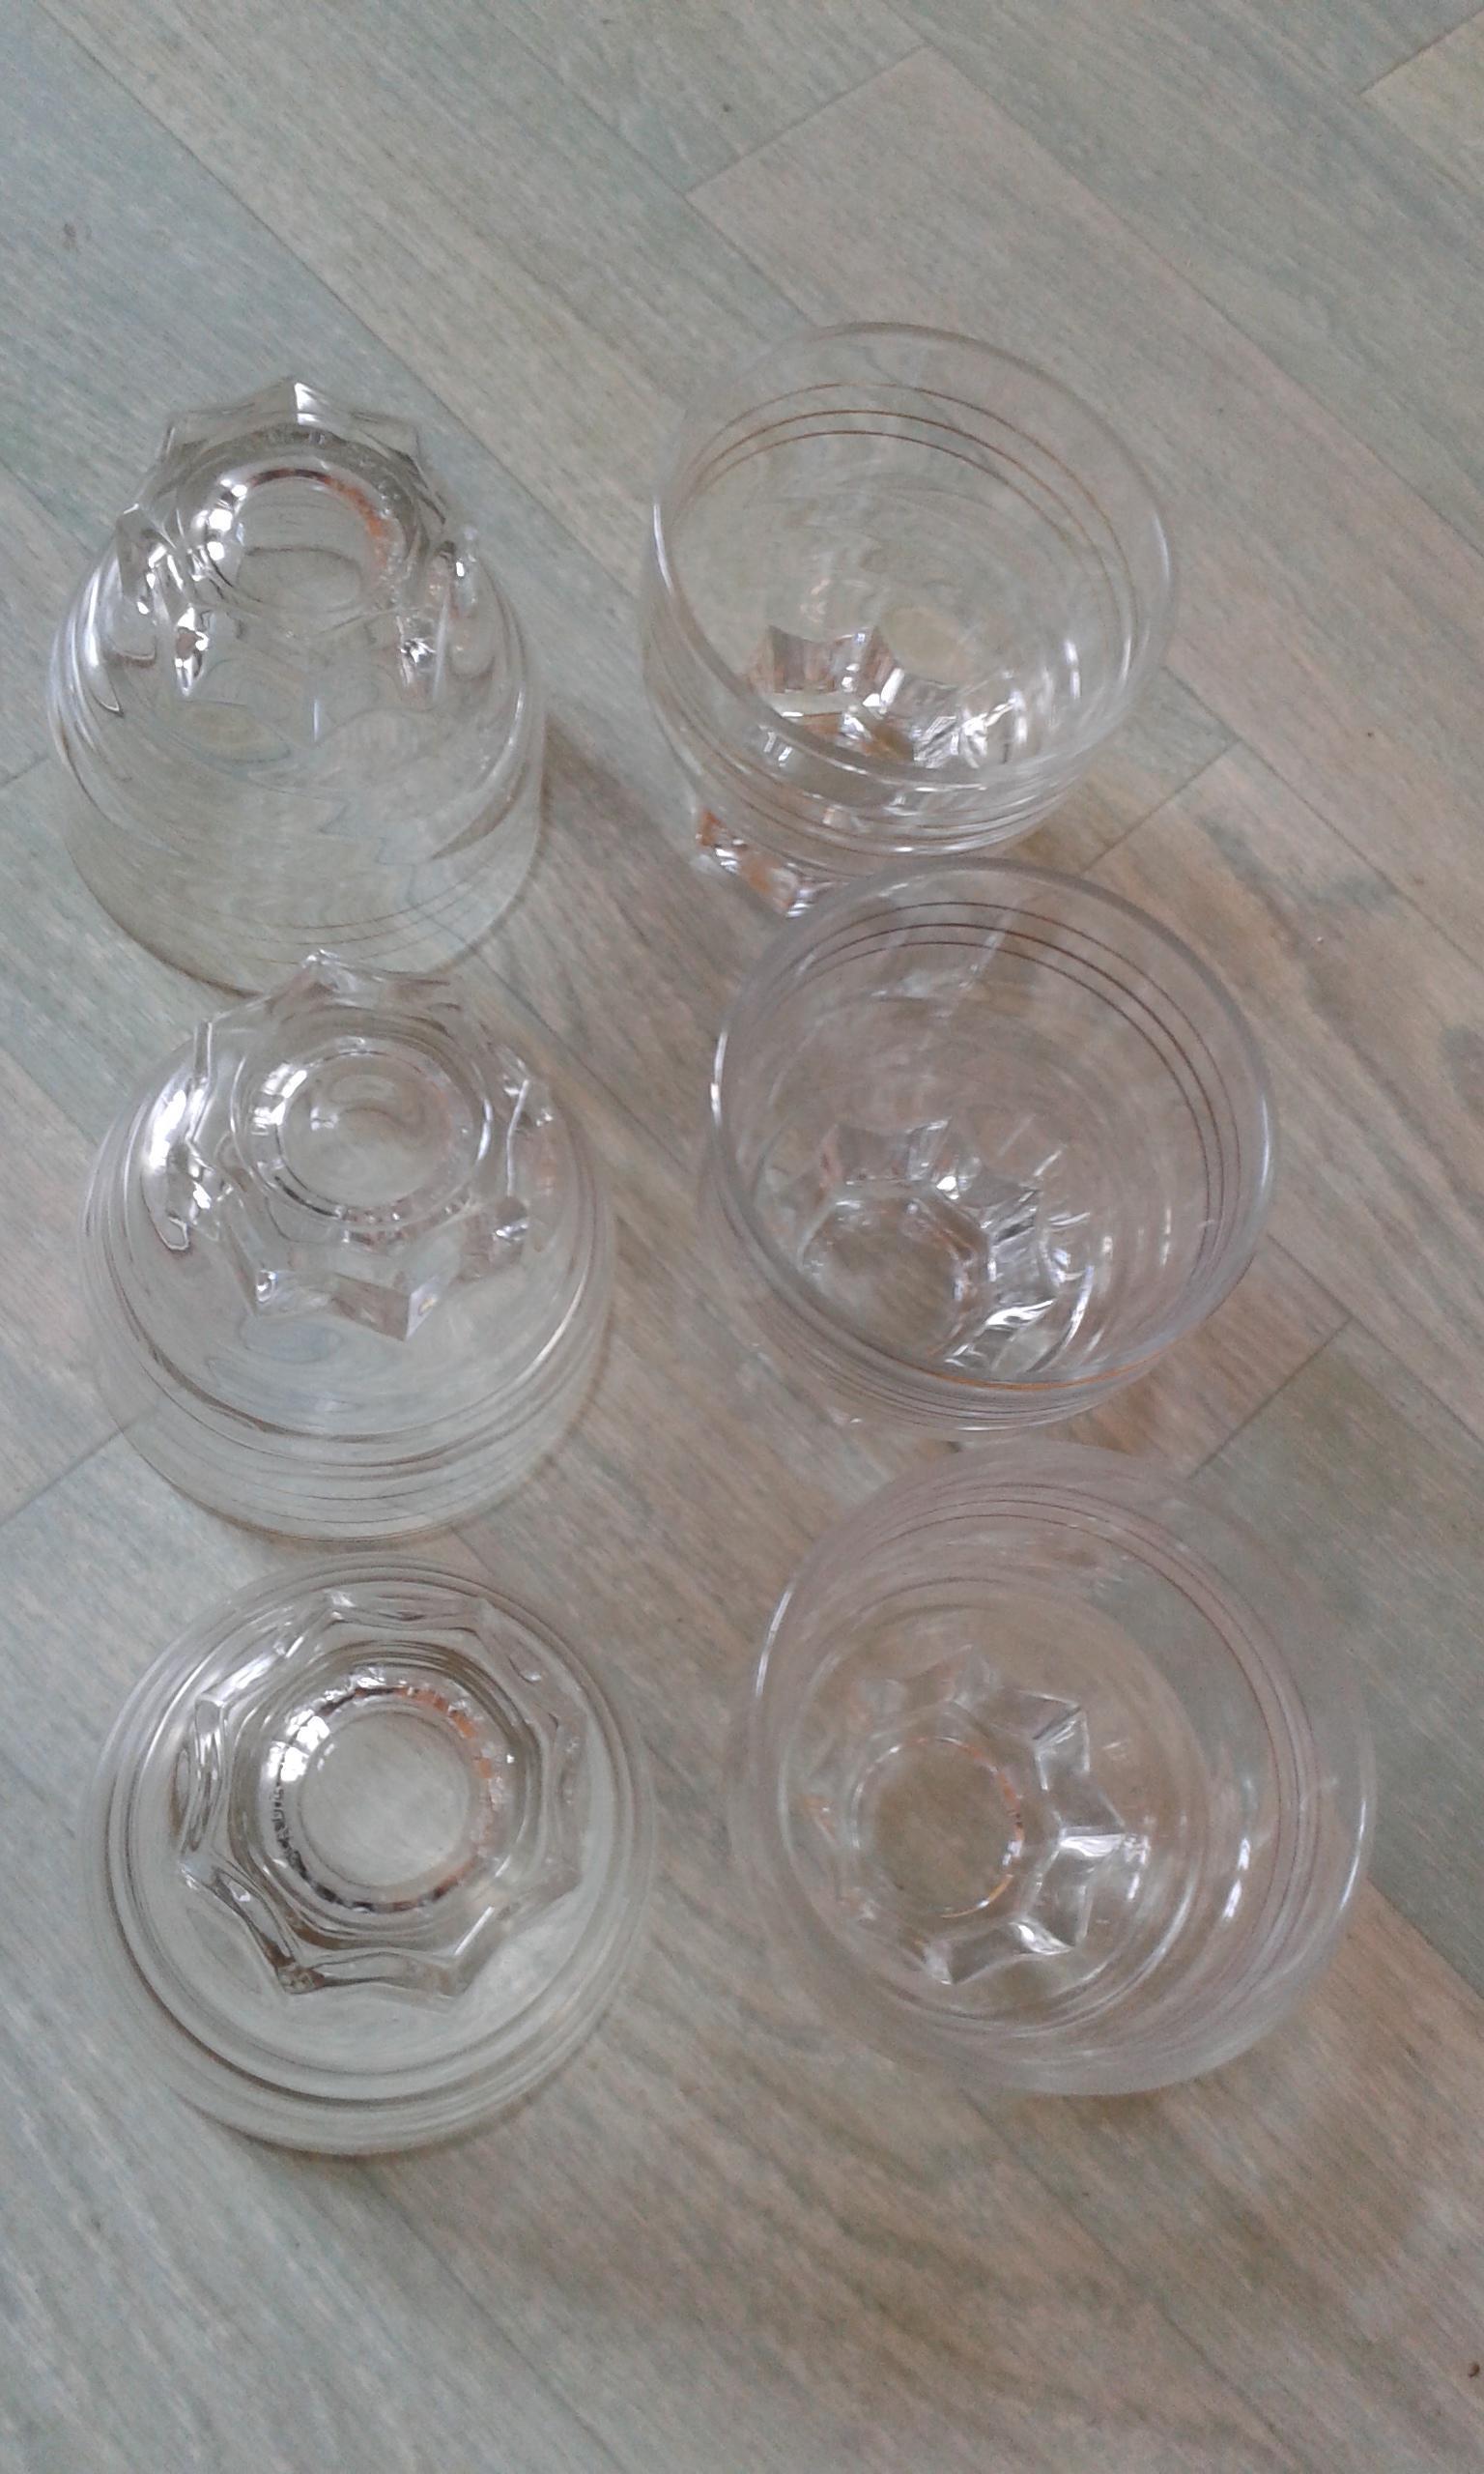 troc de troc lot de 6 verres image 1